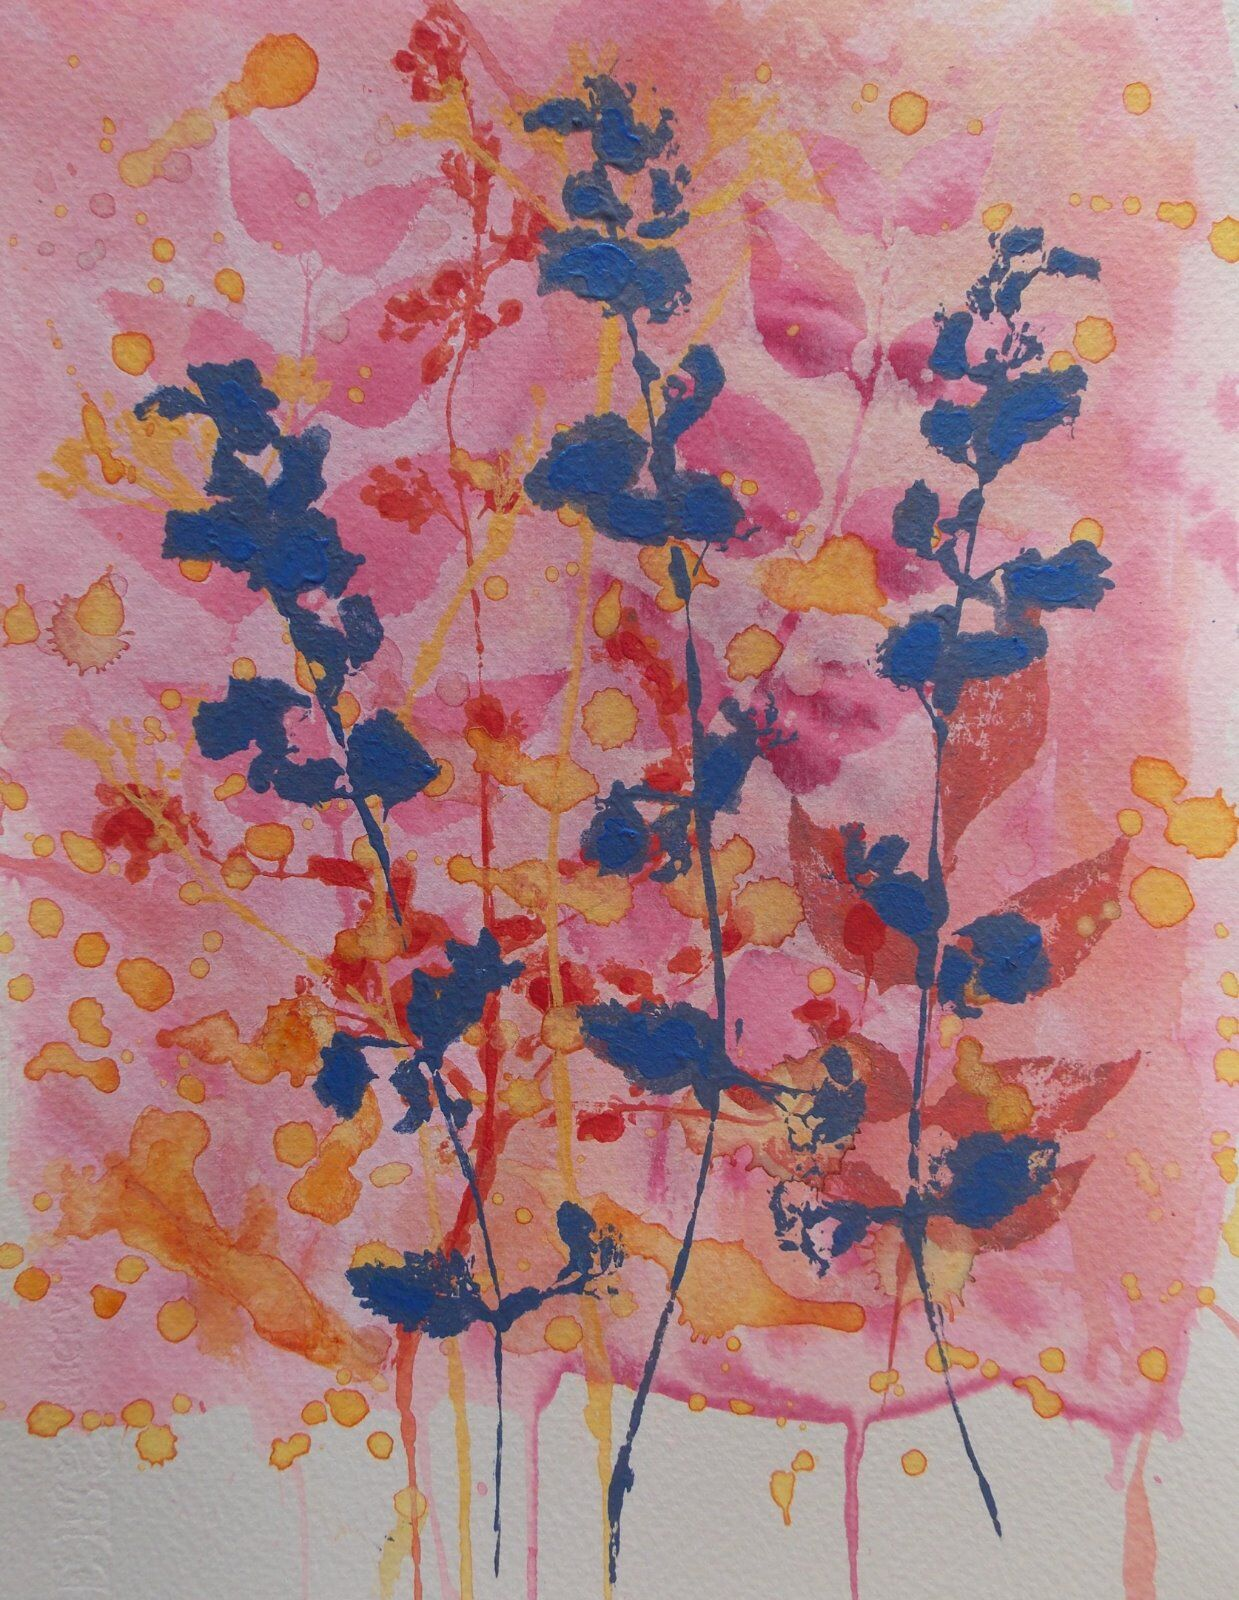 Blue Catnip on Pink